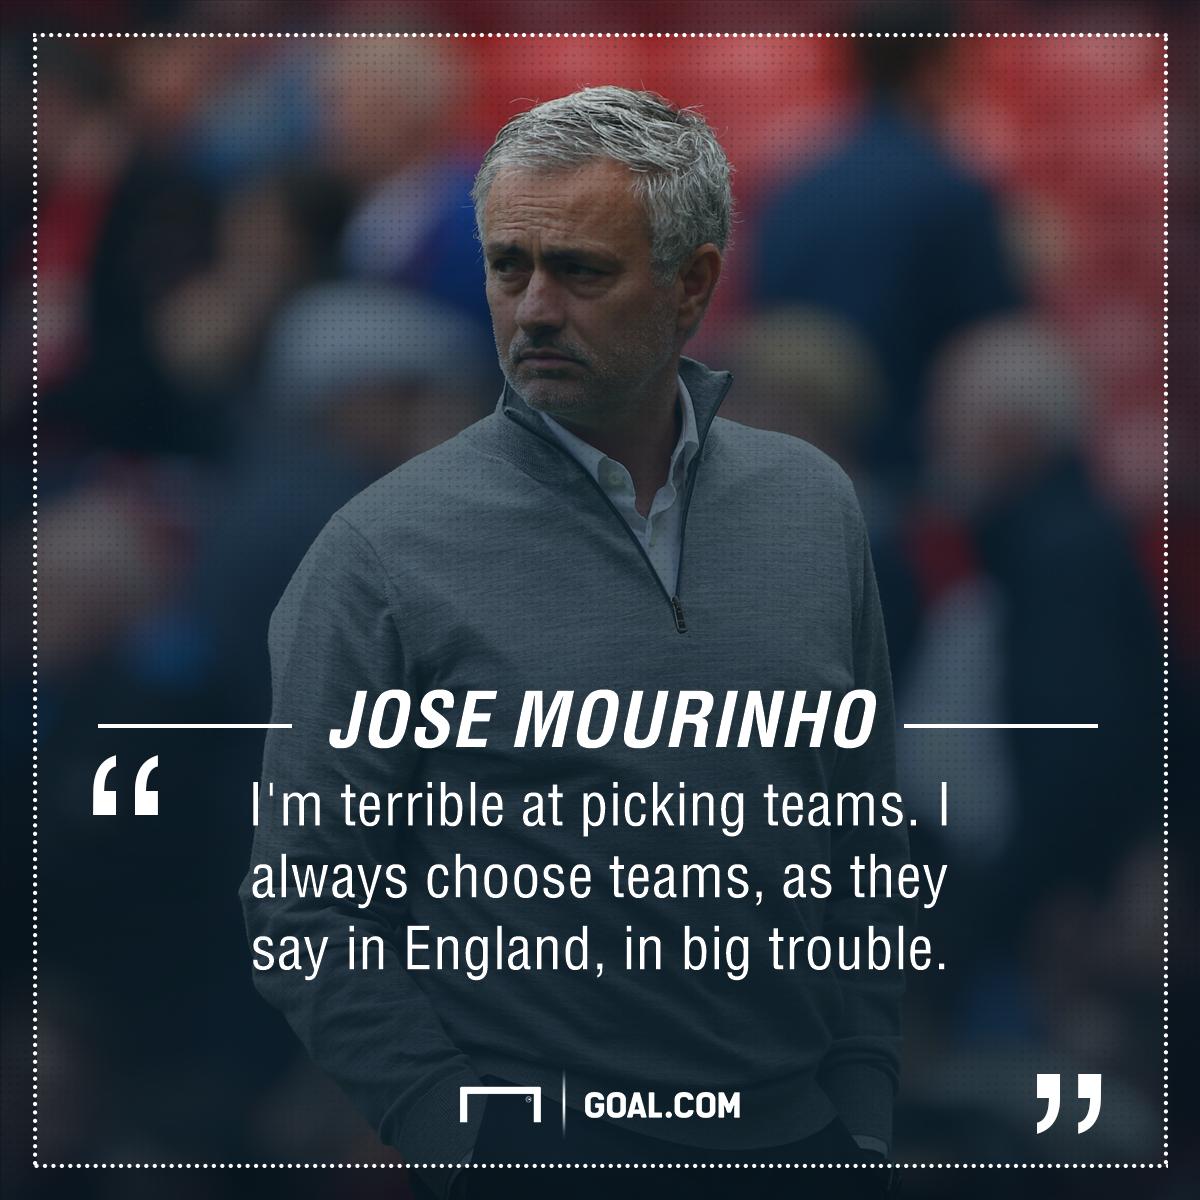 Jose Mourinho trouble